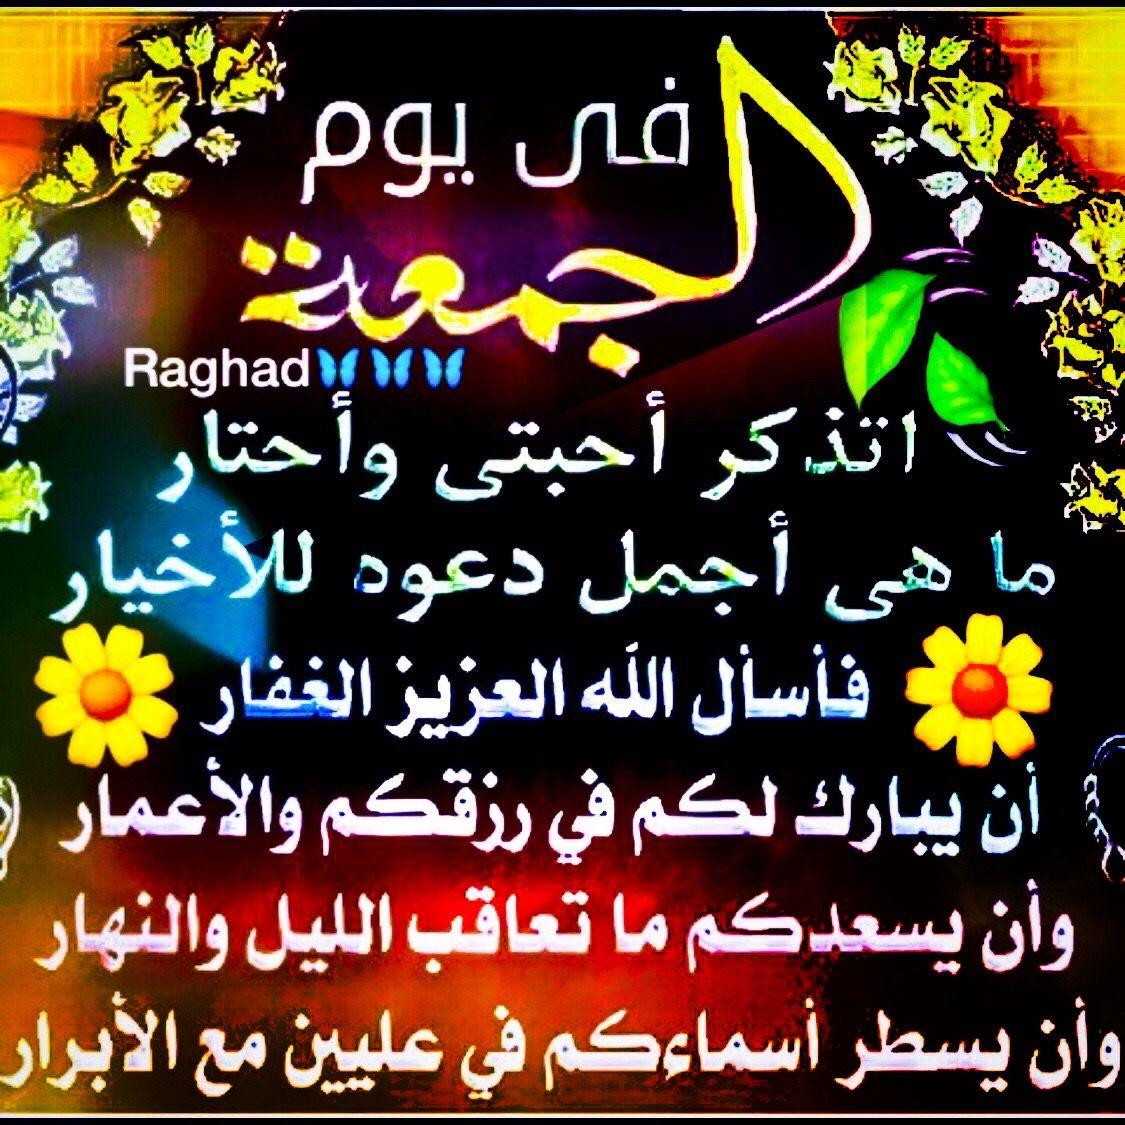 Desertrose بارك الله جمعتكم وجميع أيامكم Duaa Islam Neon Signs Desert Rose